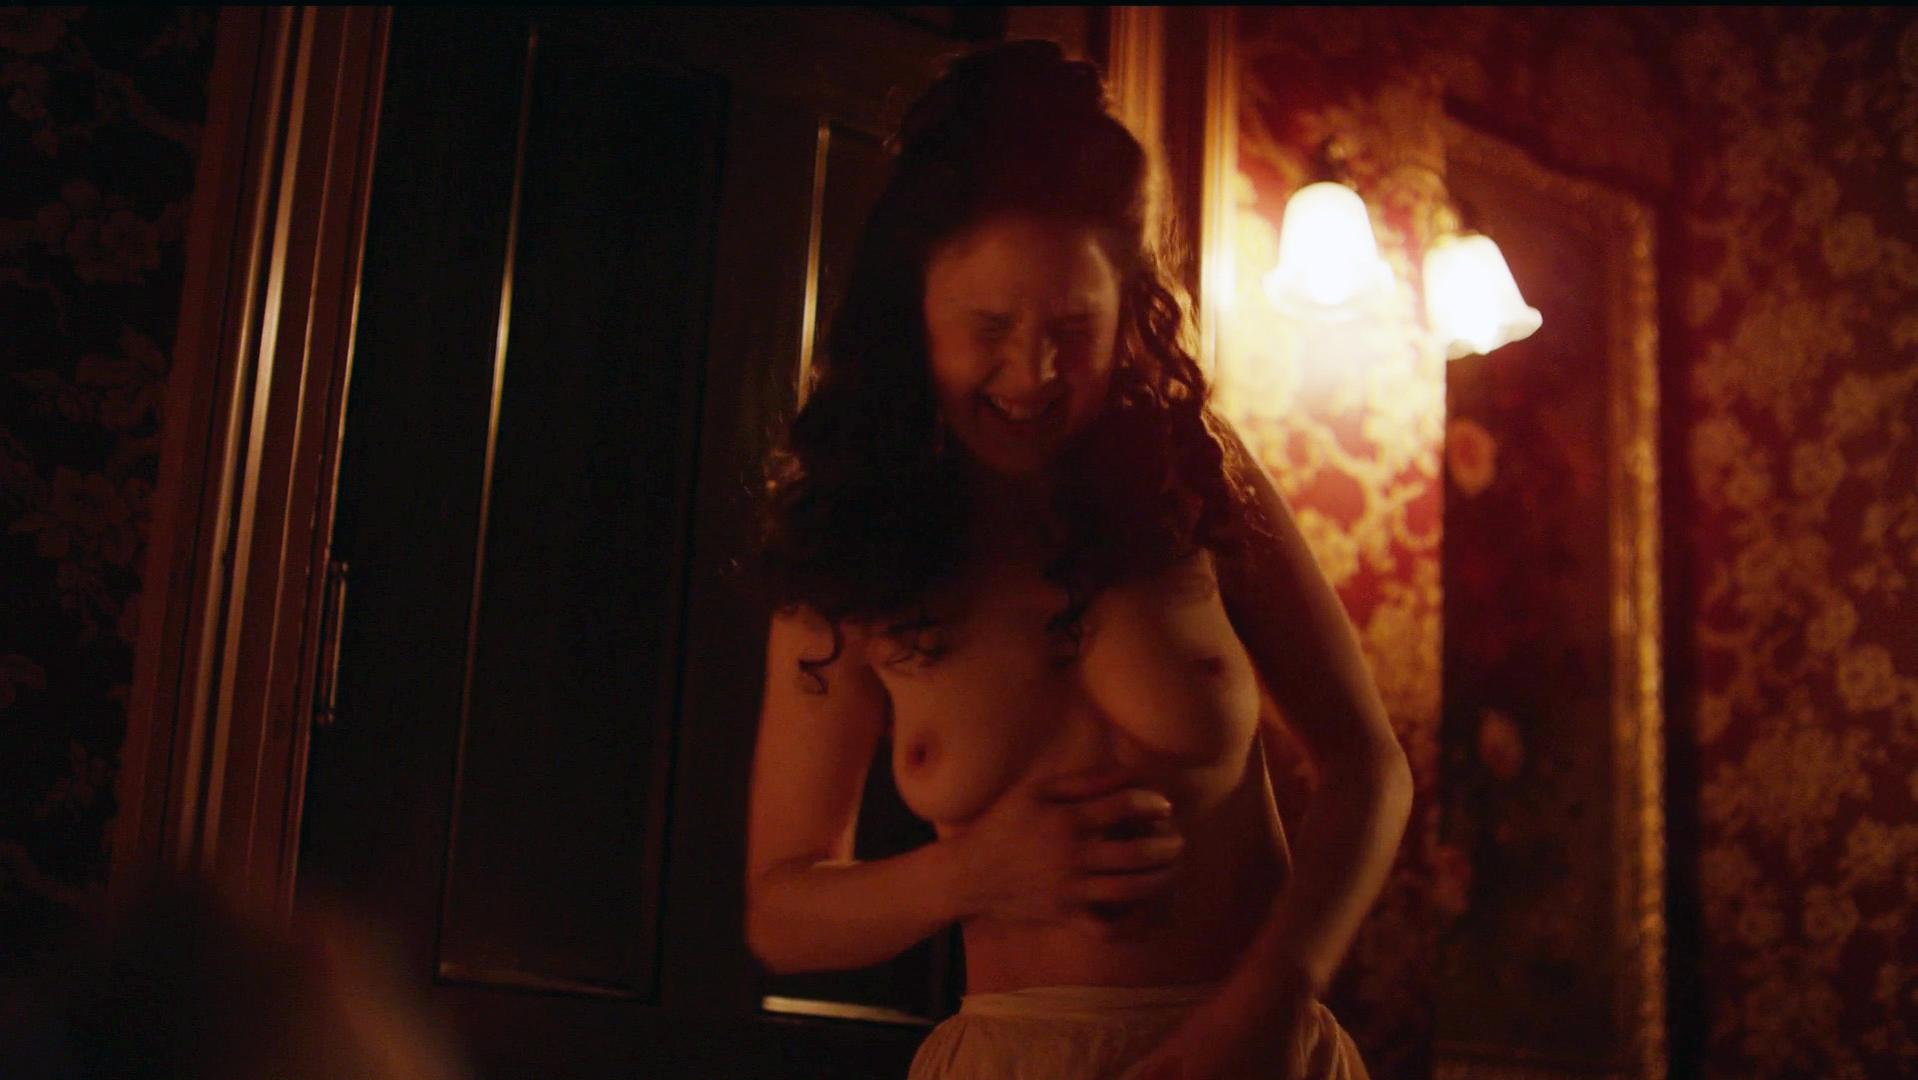 Rachel Korine nude - The Knick s01e03 (2014)